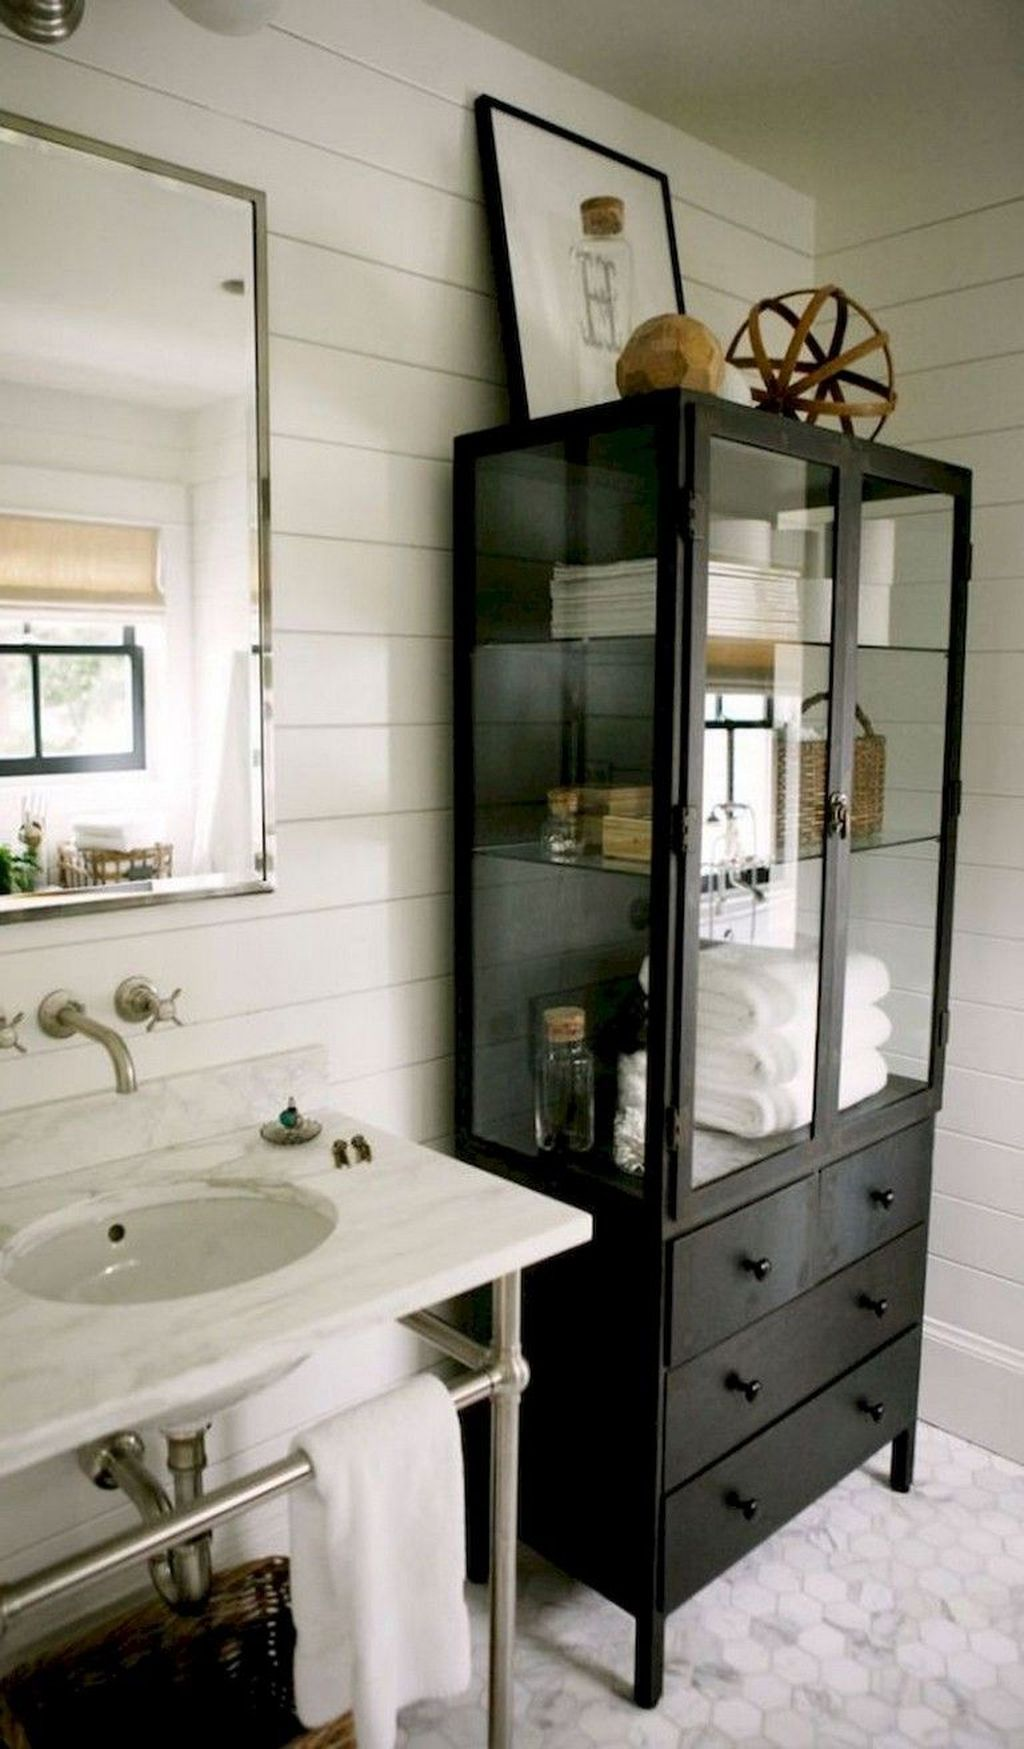 30+ Awesome DIY Bathroom Storage Ideas For Solutions